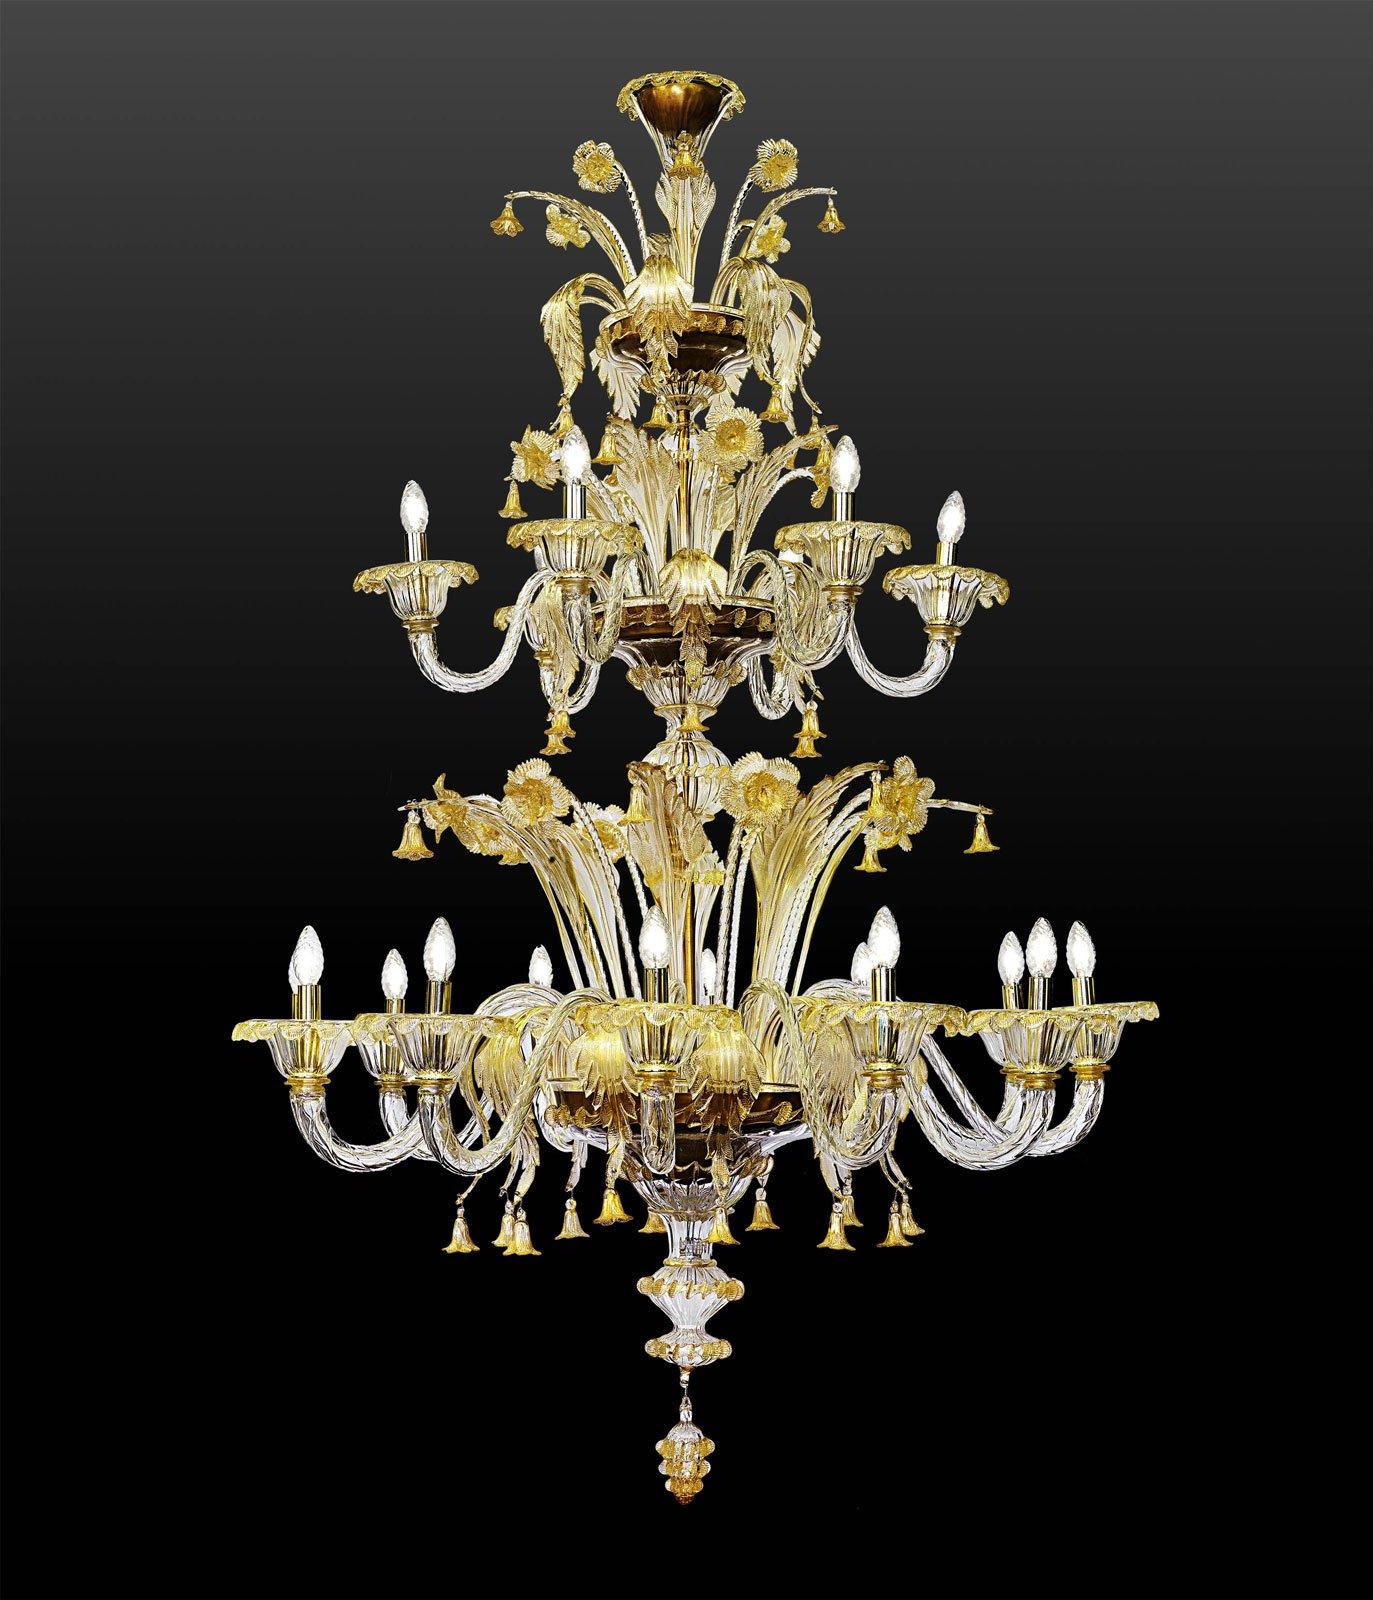 Euroluce 2015: lampadari a sospensione al Salone del Mobile - Cose di ...